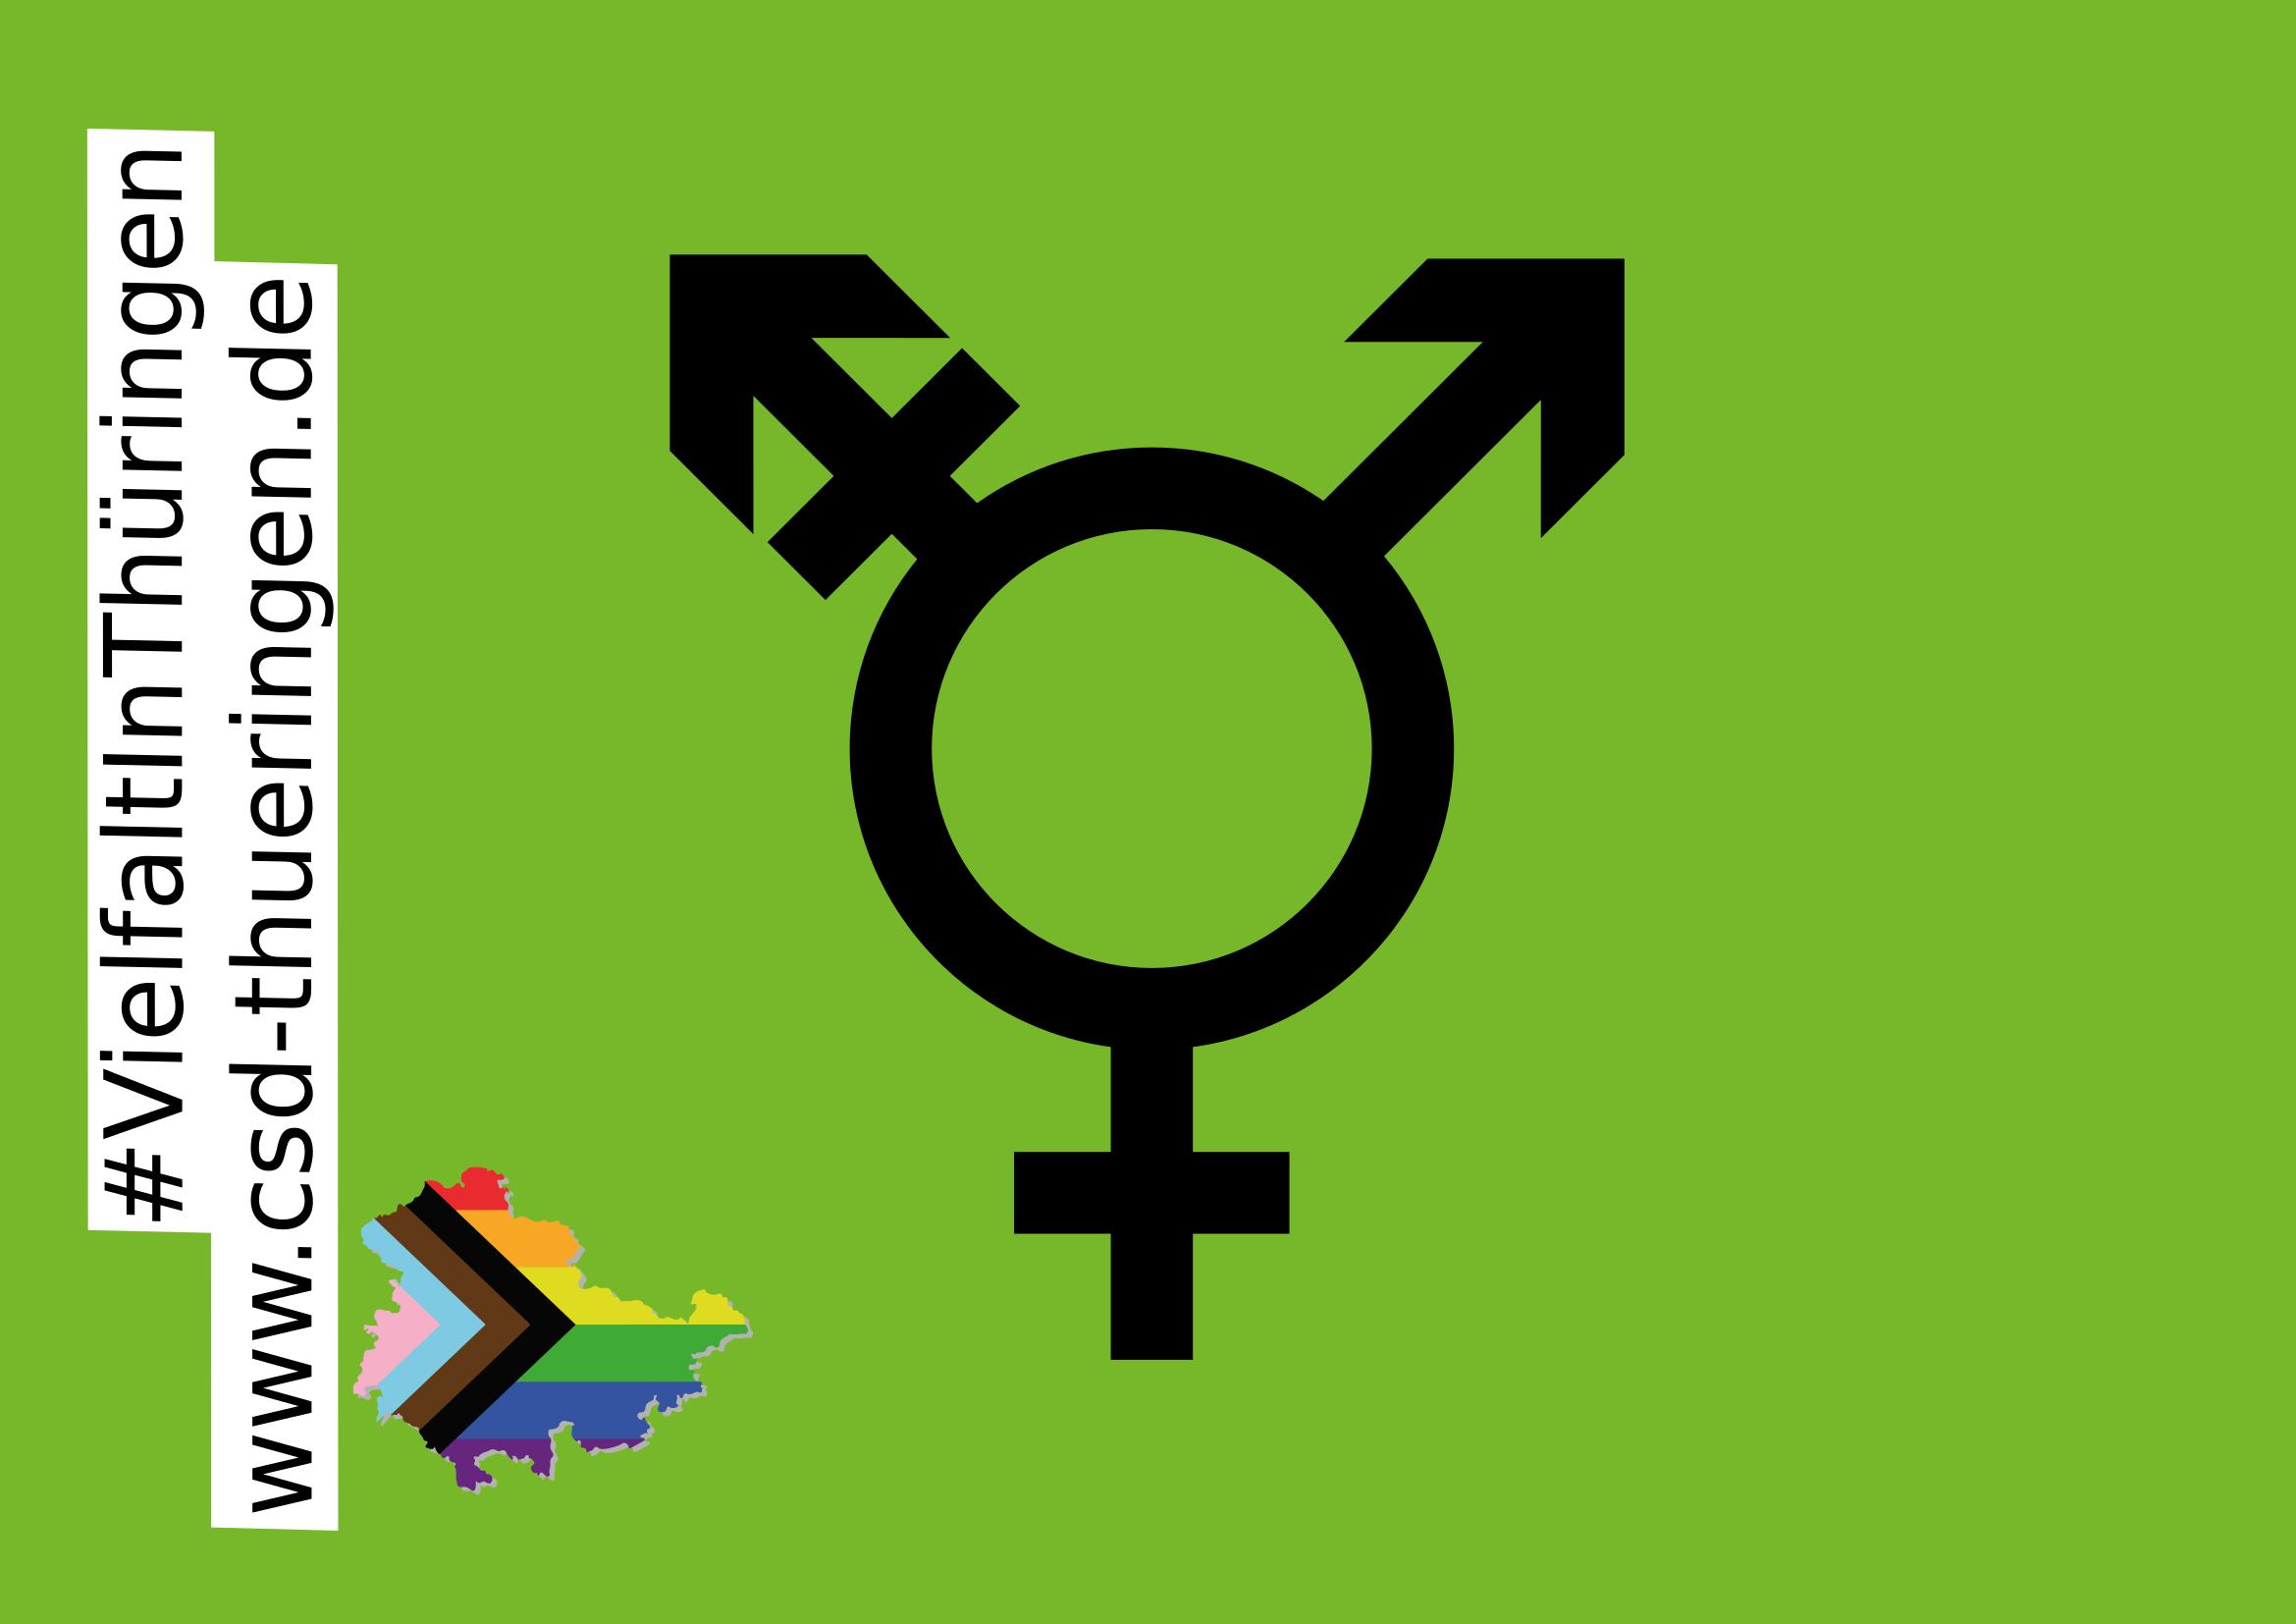 GenderqueerNonbinary.png